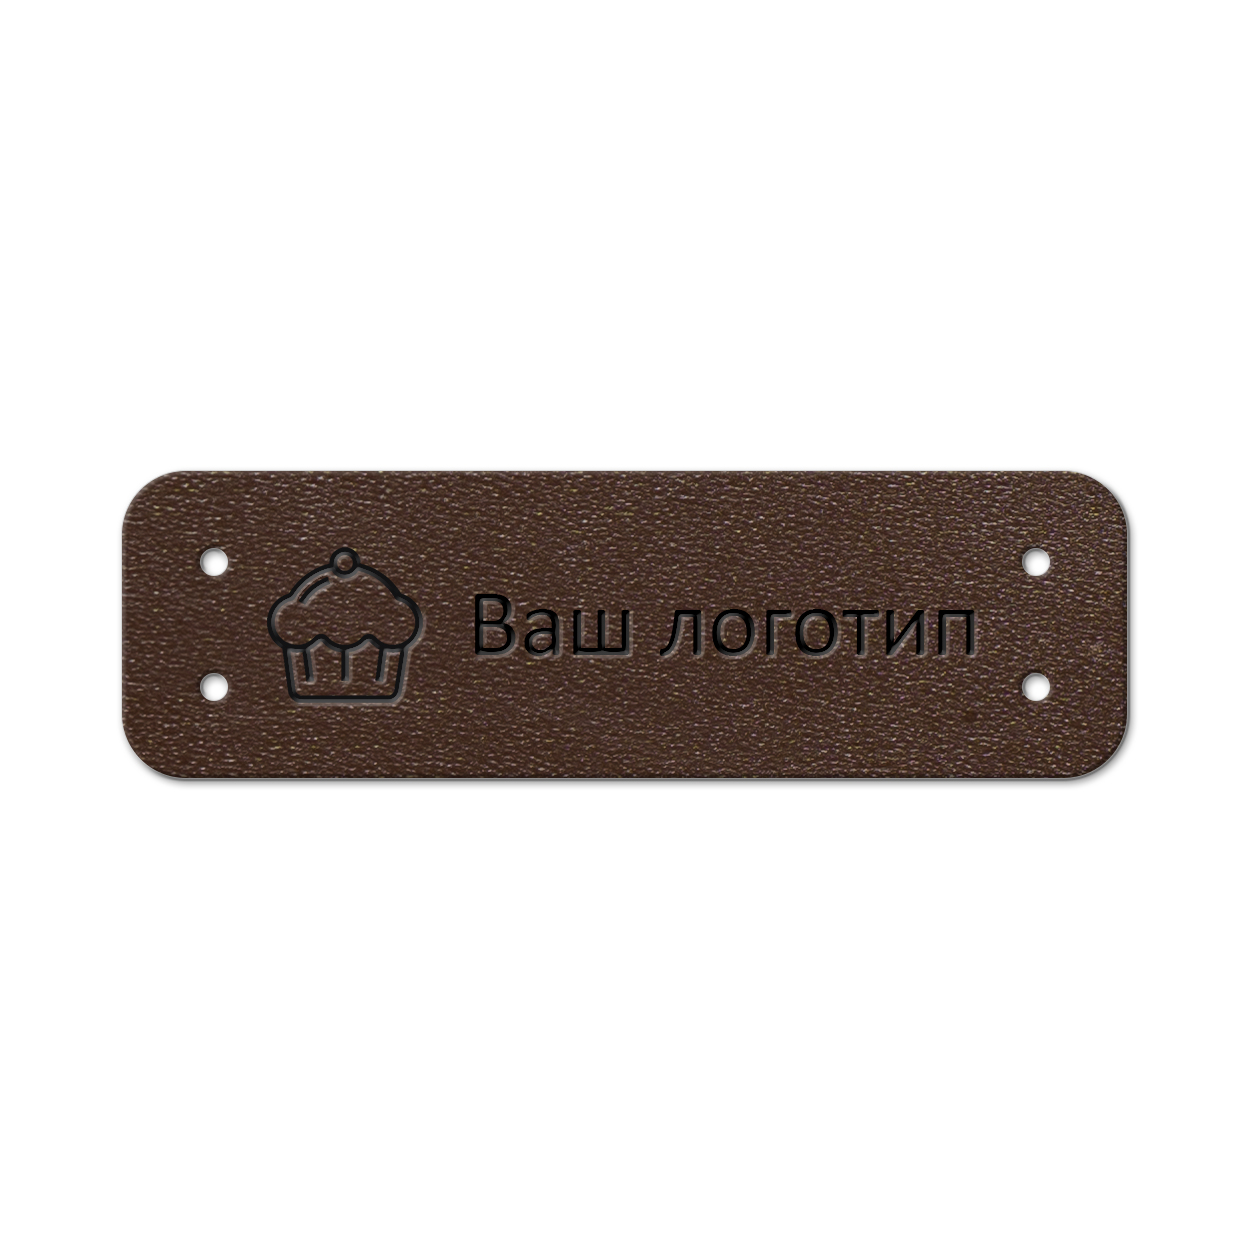 Бирка пришивная 1,2 х 4 cм. 10 шт. Горький шоколад